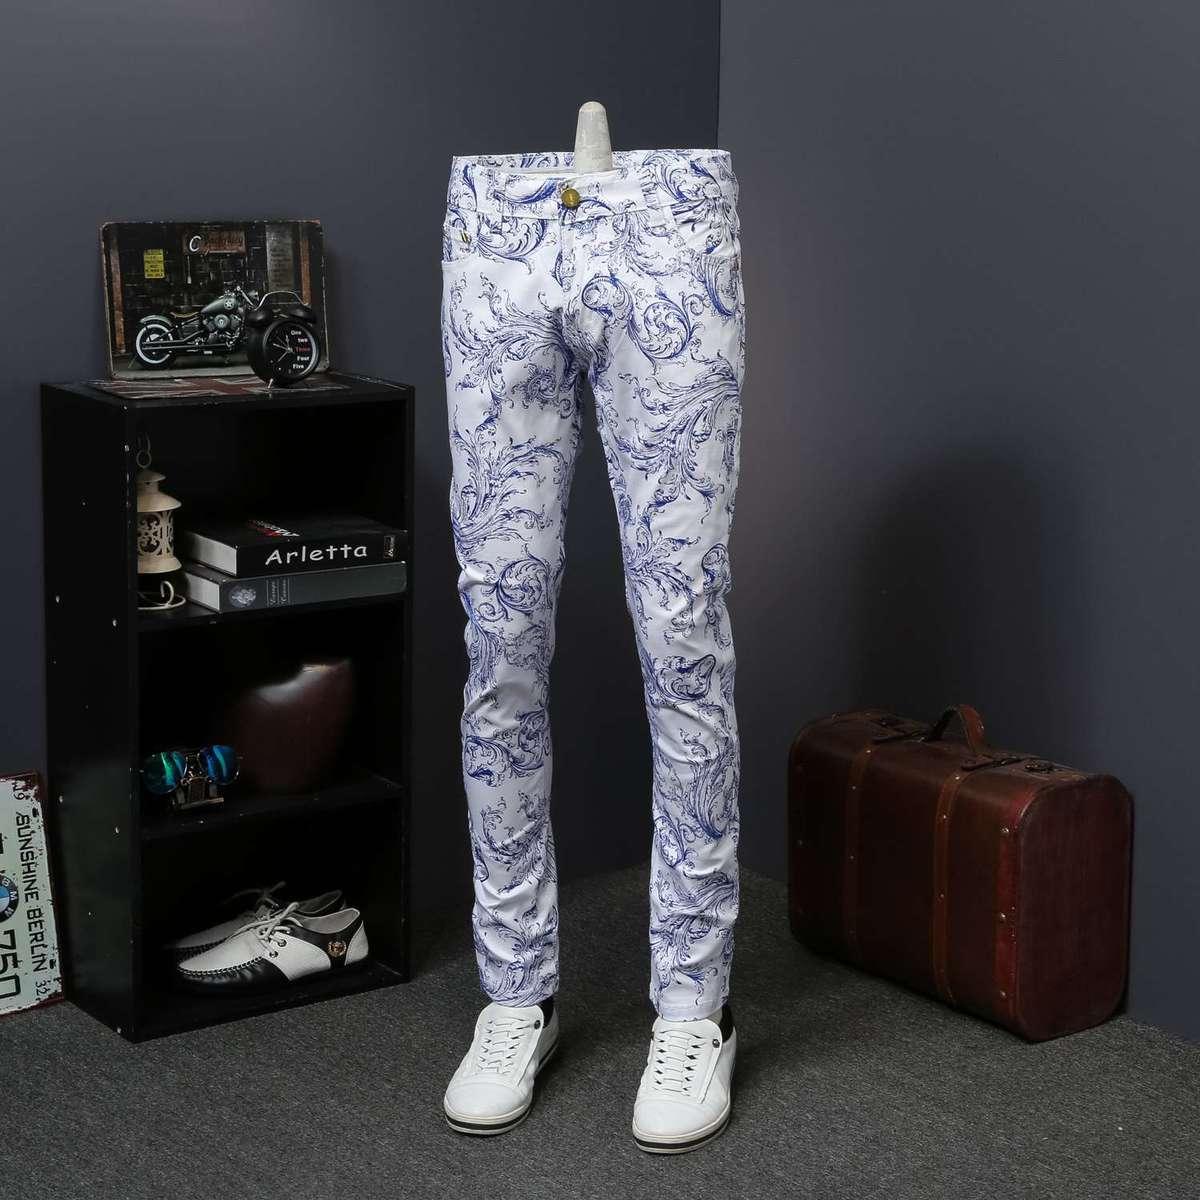 Floral Print Jeans Denim Mens Skinny Jeans Casual Vaqueros Hombre Skinny Erkek Jean Pantolon Calca Jeans Masculina